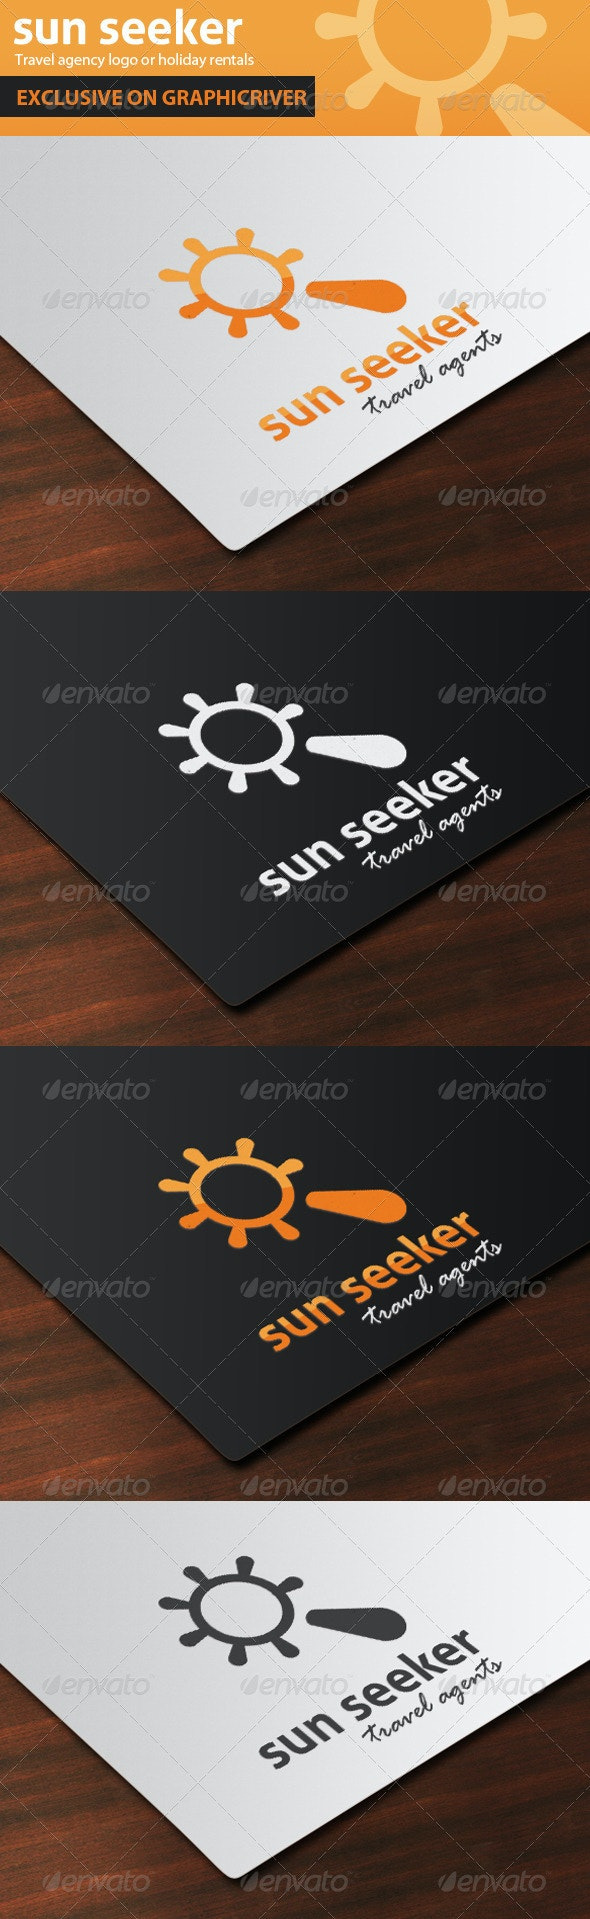 Sun Seeker Travel Agent Logo - Objects Logo Templates